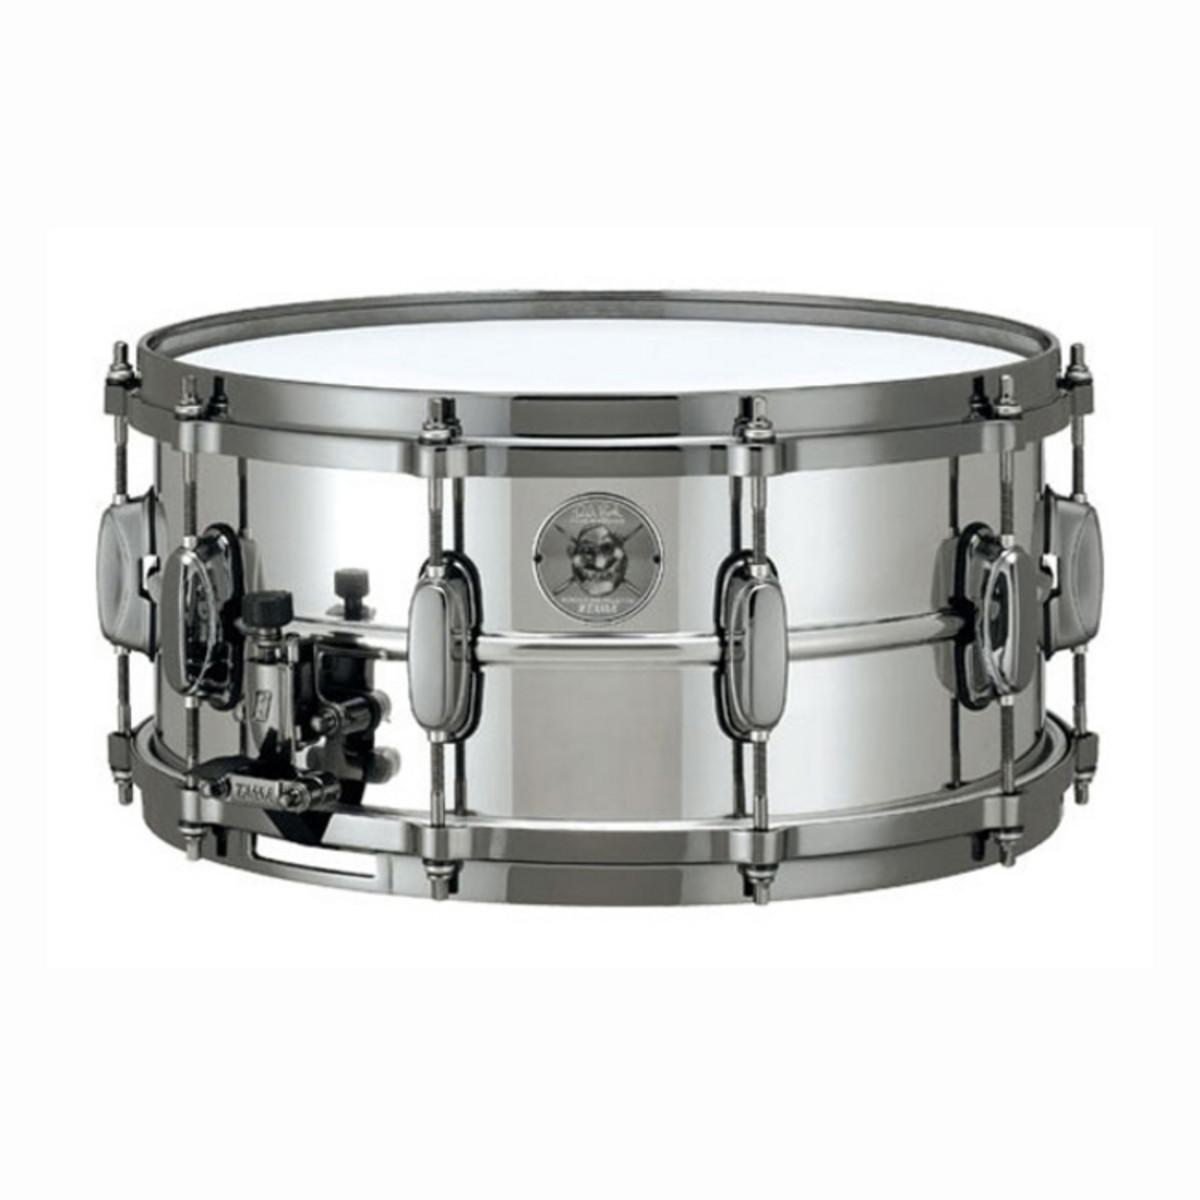 Tama Charlie Benante Signature 14 x 6.5 Snare Drum